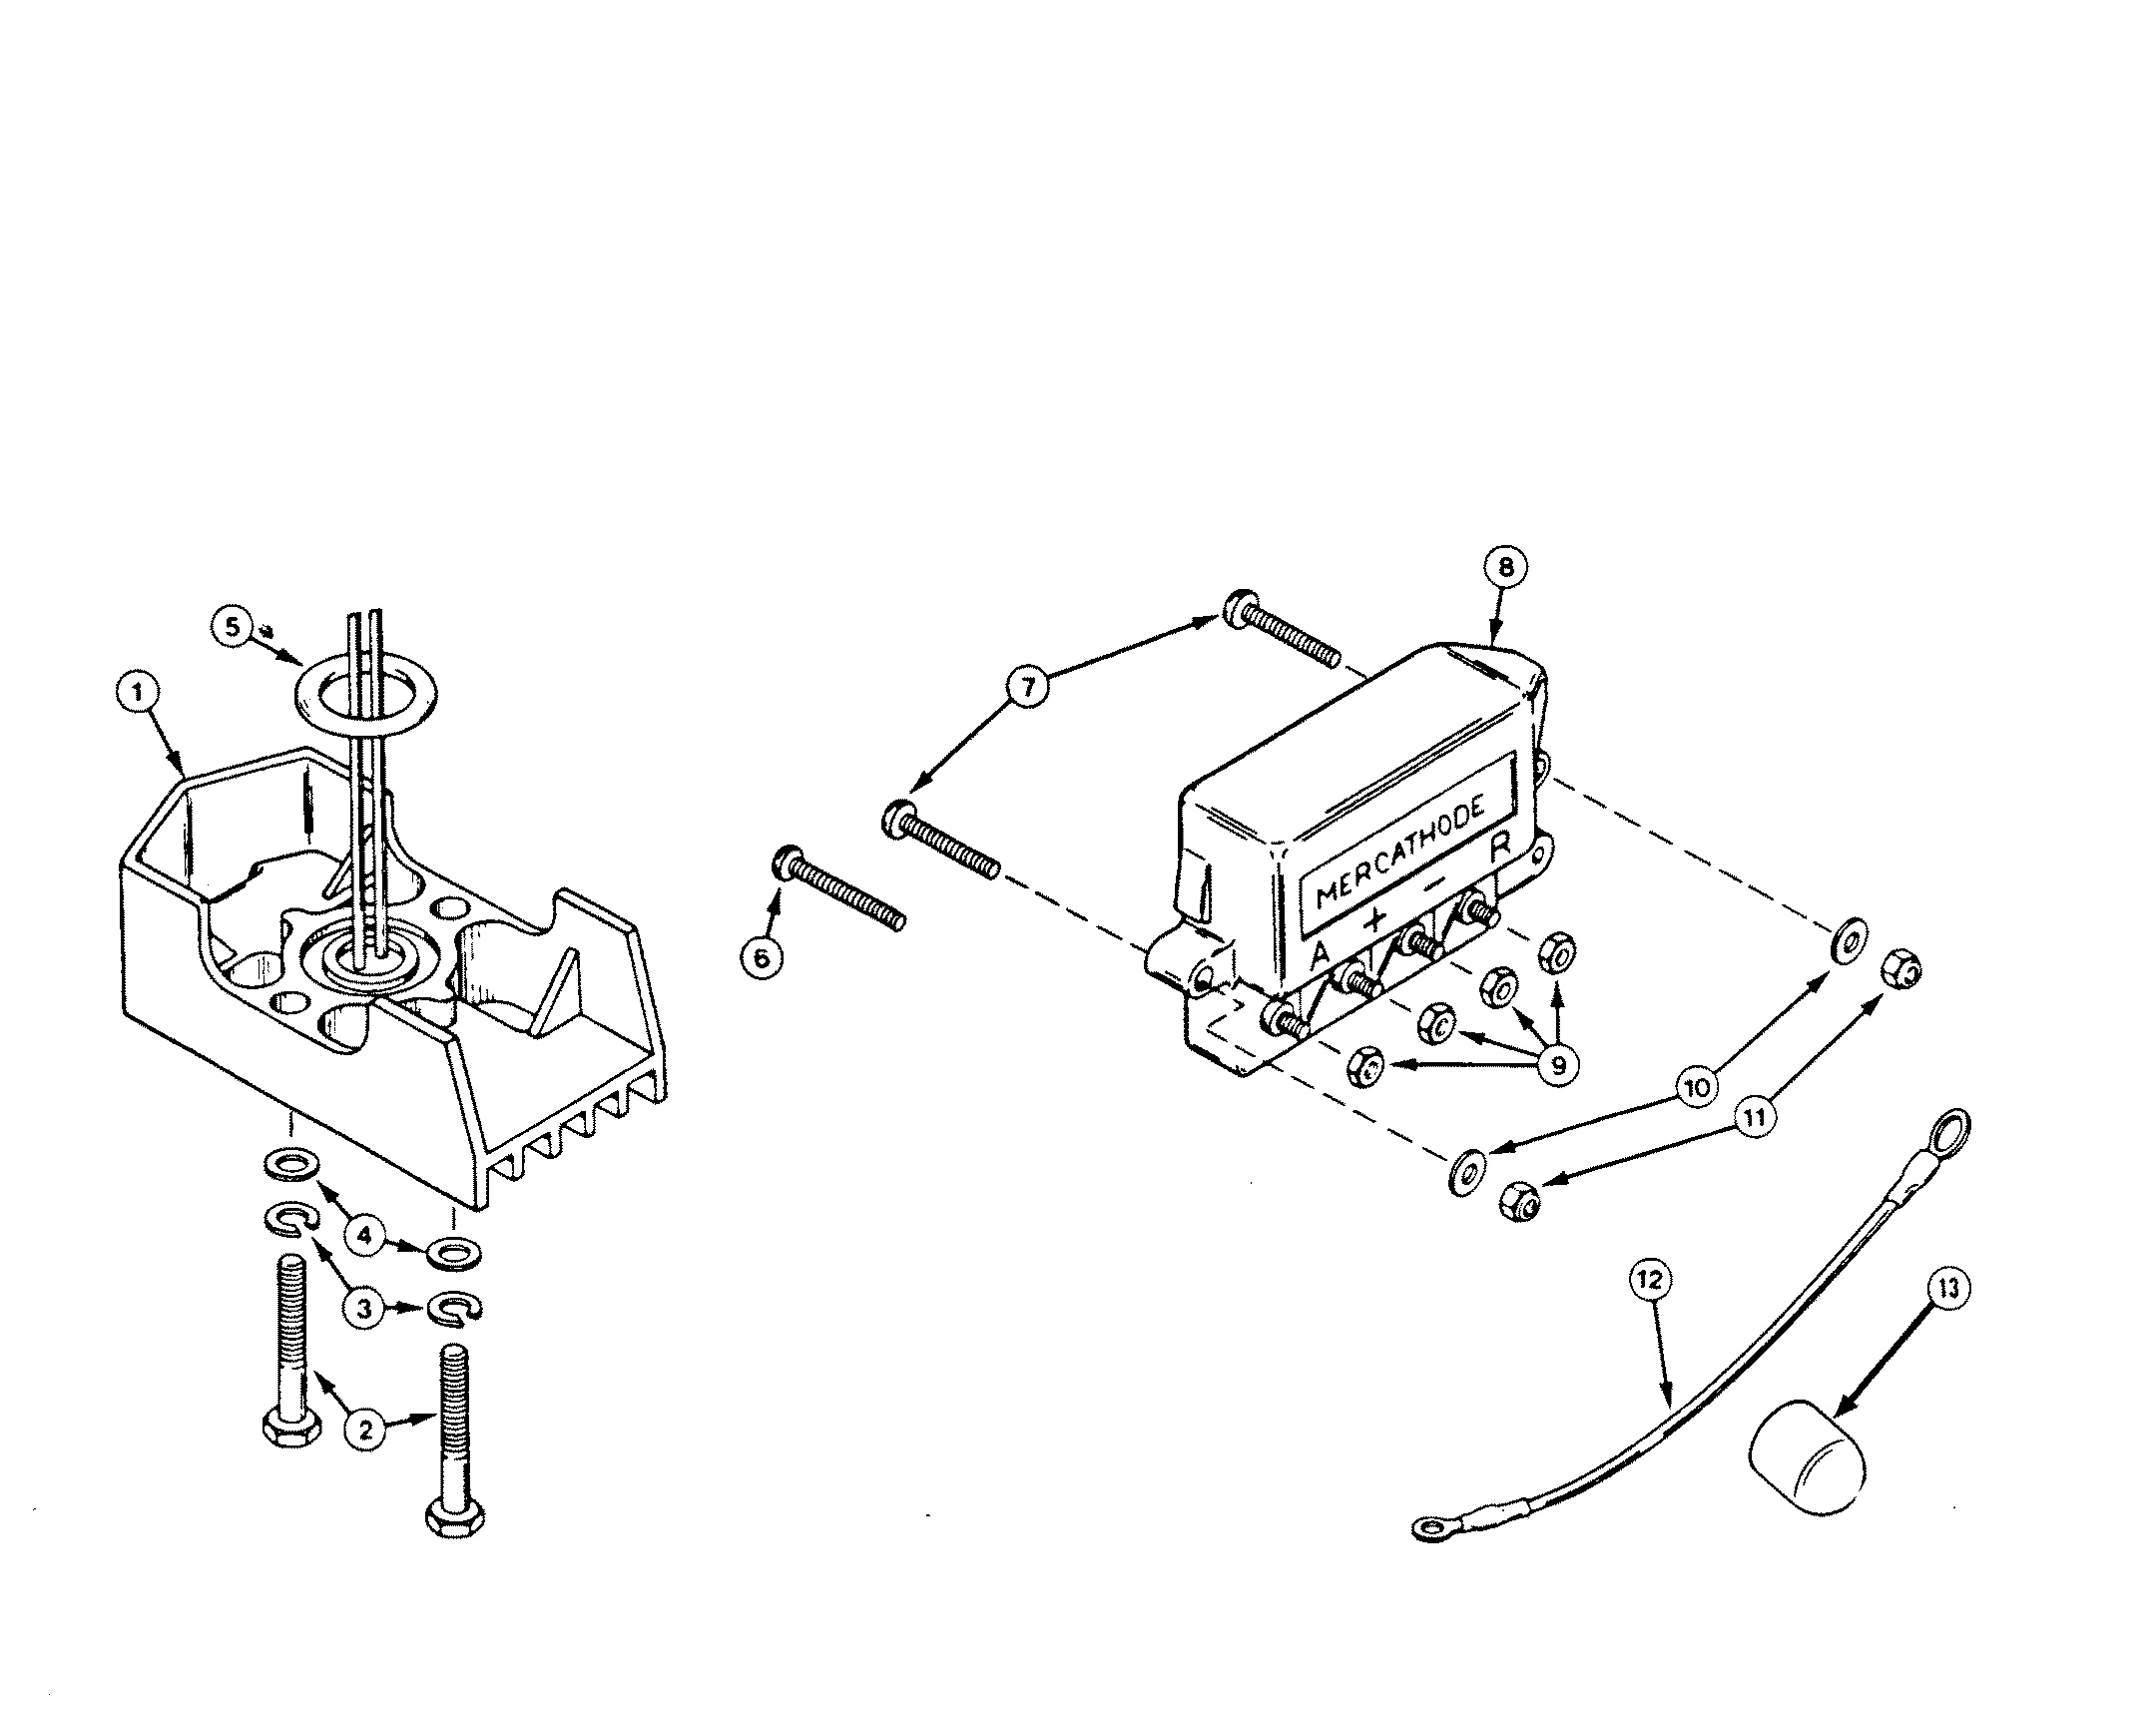 1987 Mercruiser 3 0 Wiring Diagram Master Blogs Engine Mercathode Box Rh 26 Pfotenpower Ev De 30 Trim 43 Starter